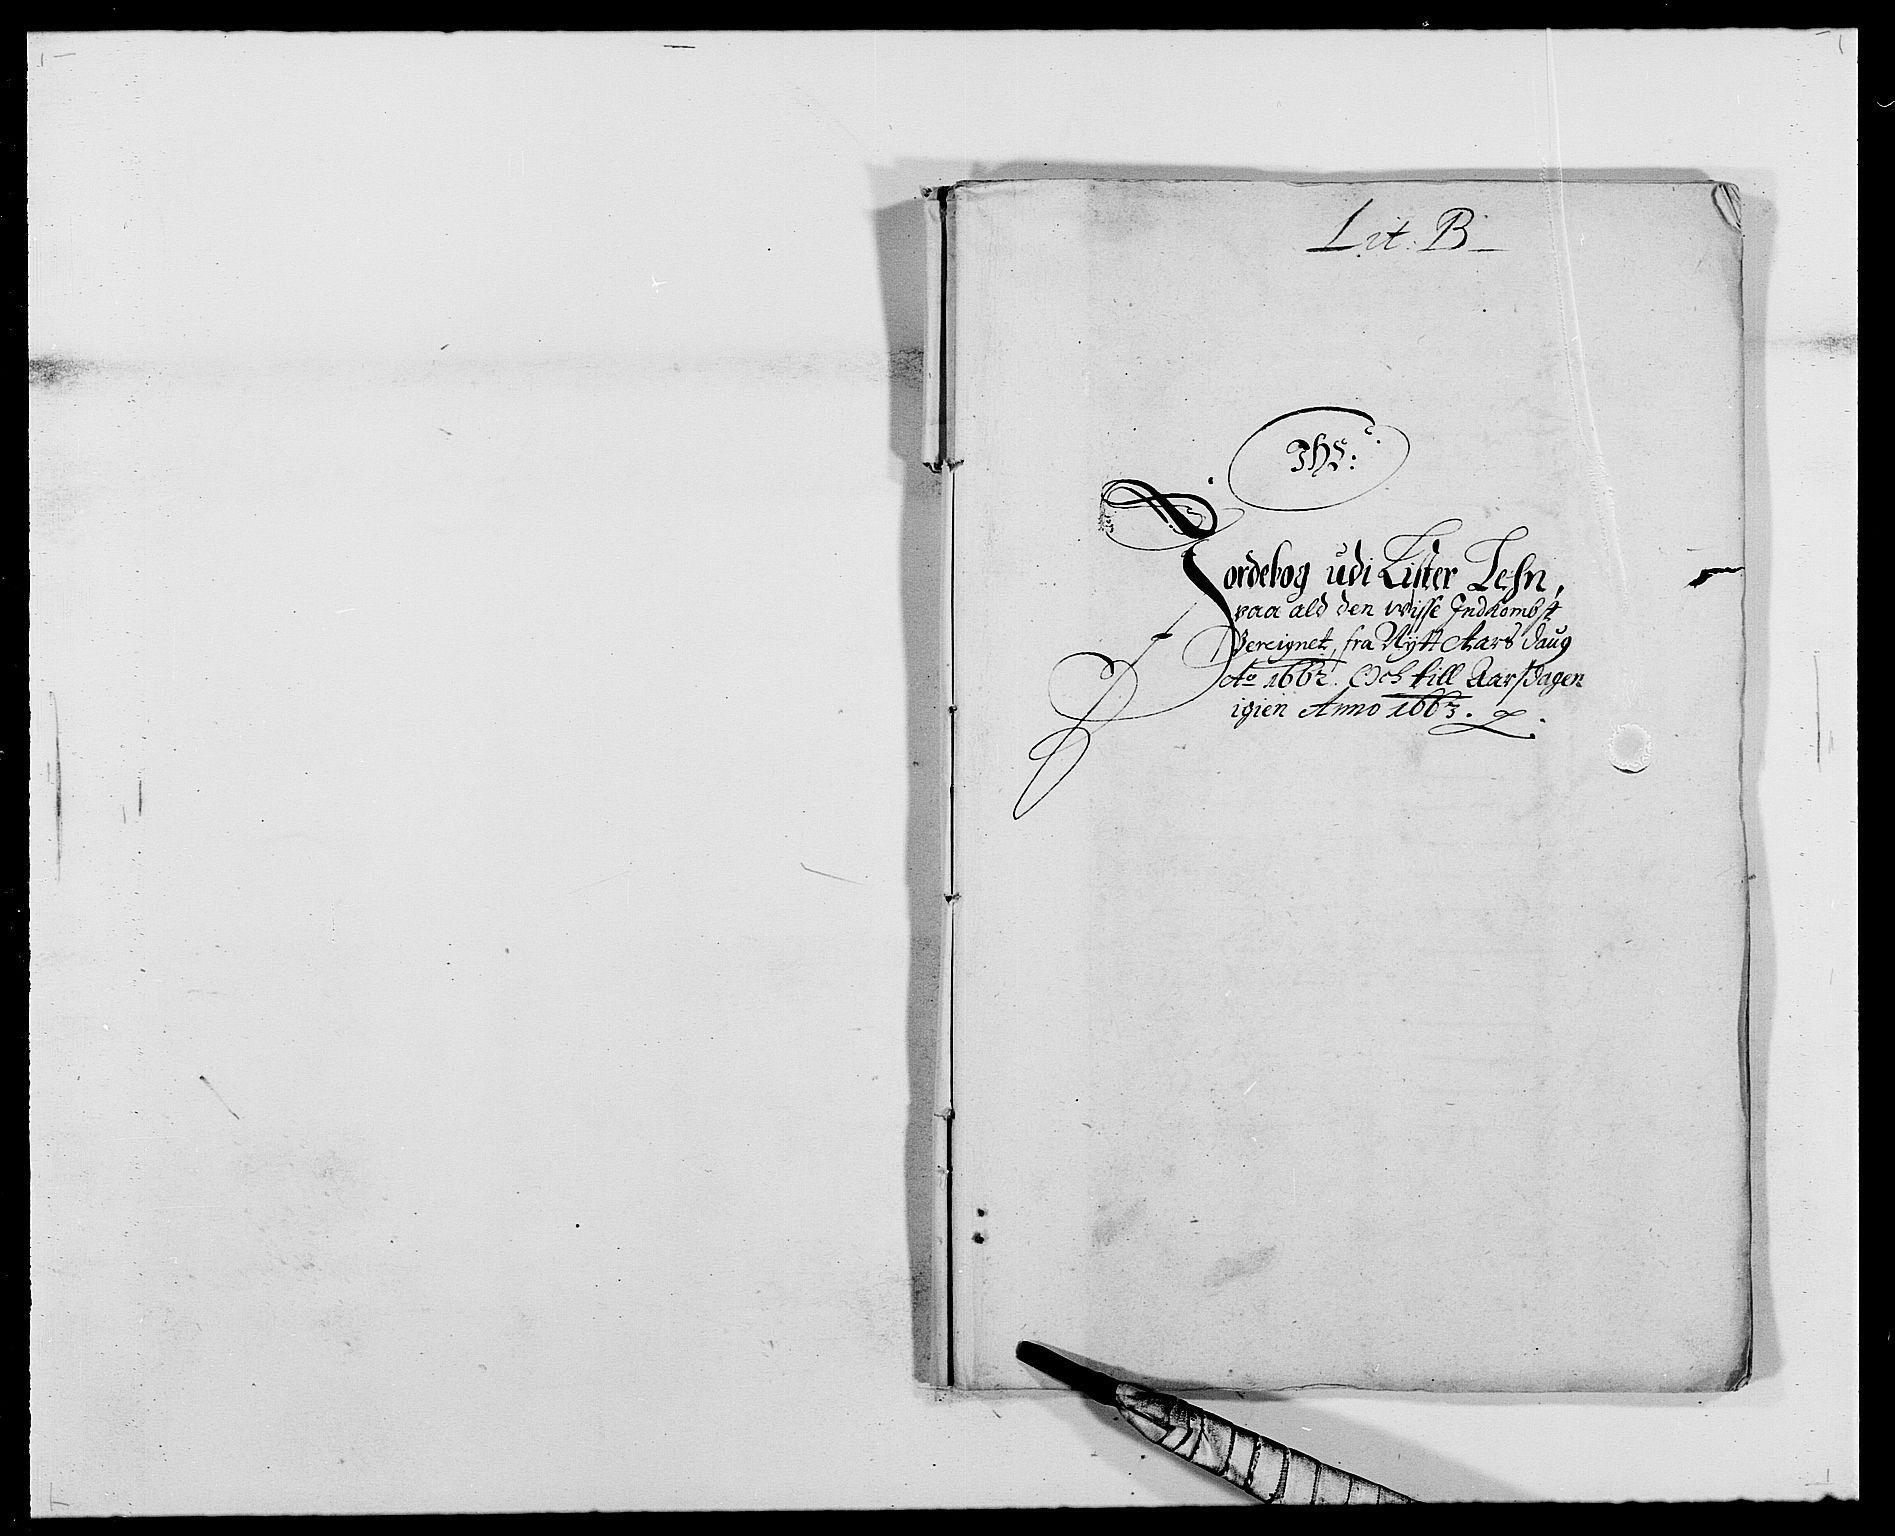 RA, Rentekammeret inntil 1814, Reviderte regnskaper, Fogderegnskap, R41/L2522: Fogderegnskap Lista, 1662, s. 18